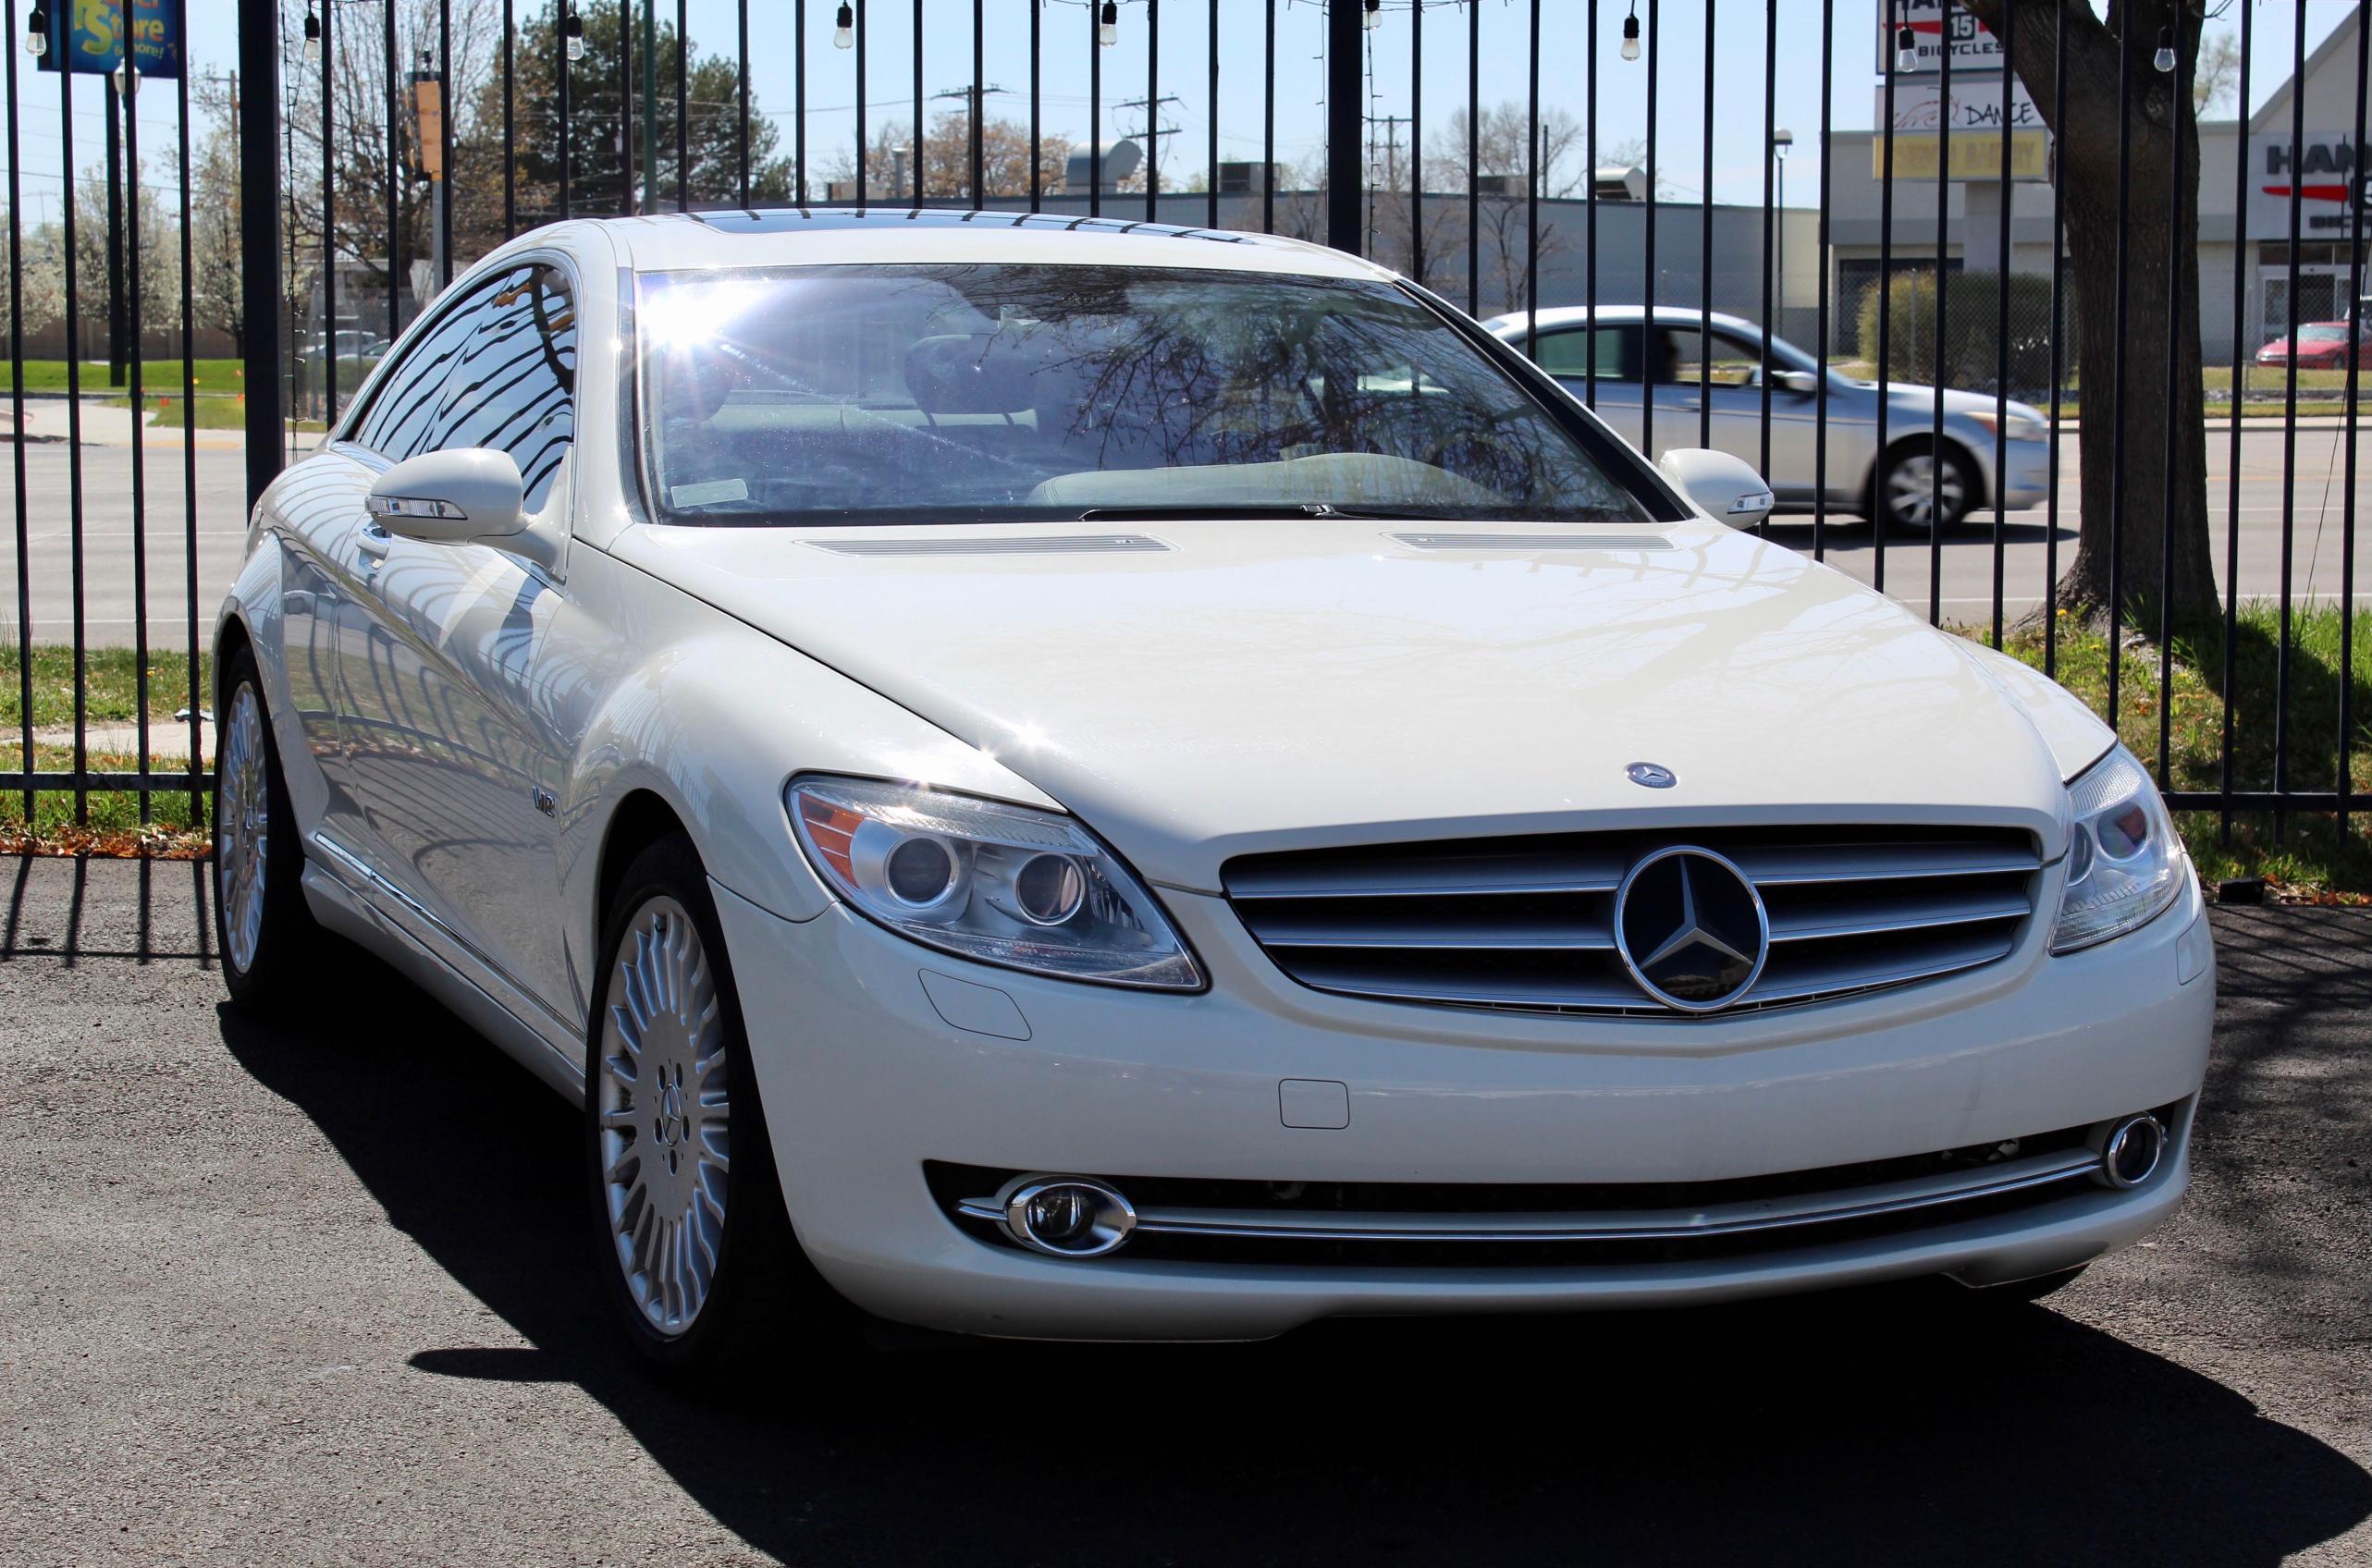 Mercedes-Benz Vehiculos salvage en venta: 2007 Mercedes-Benz CL 600